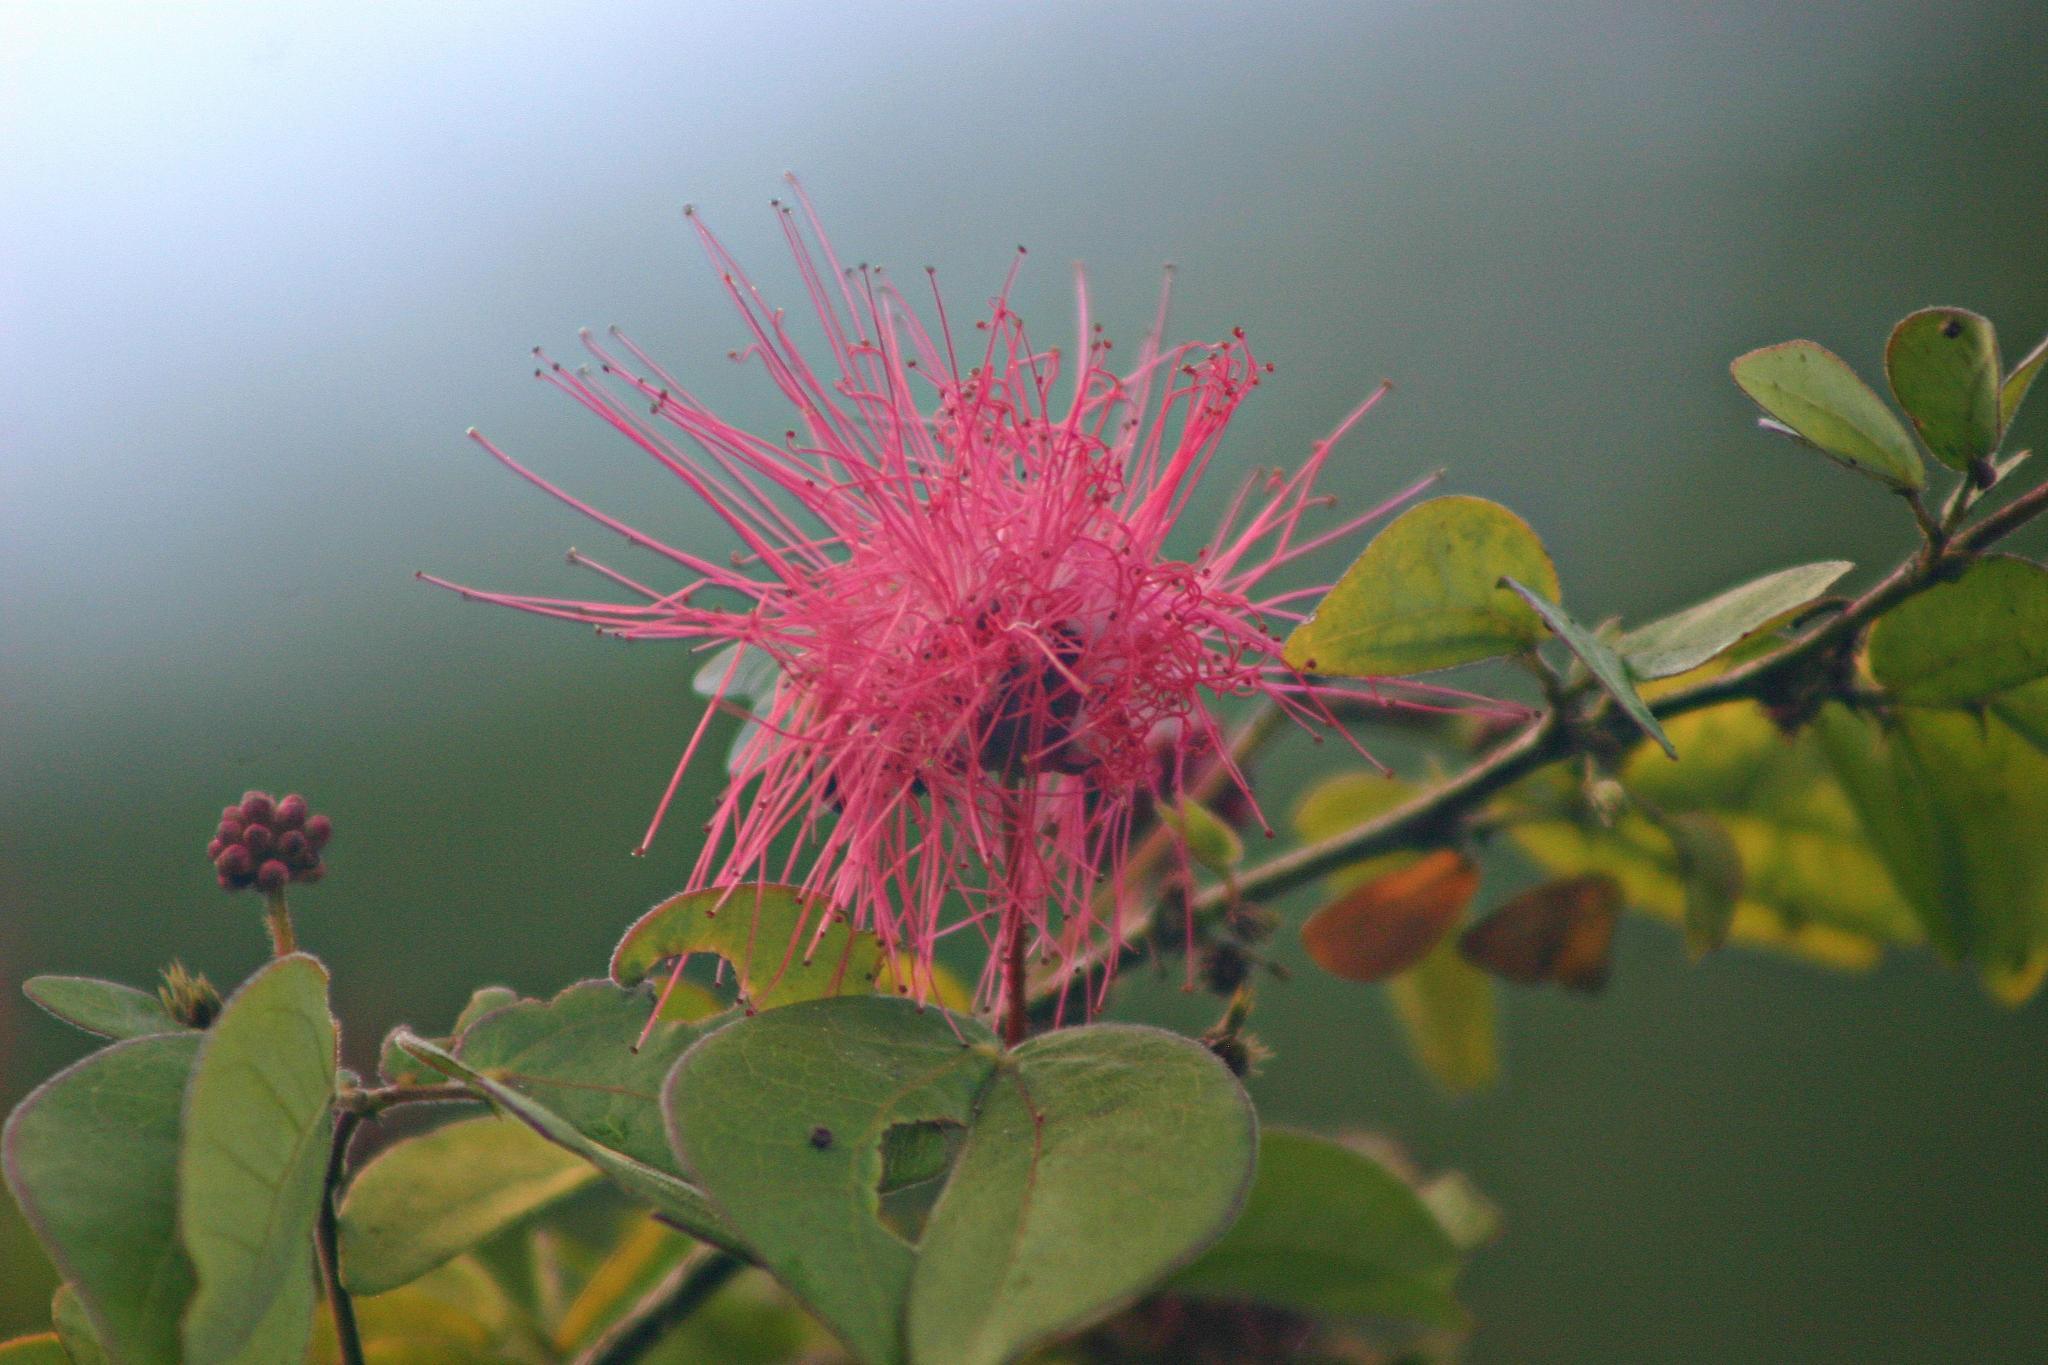 PINK FLOWER BUD by bechcomber444